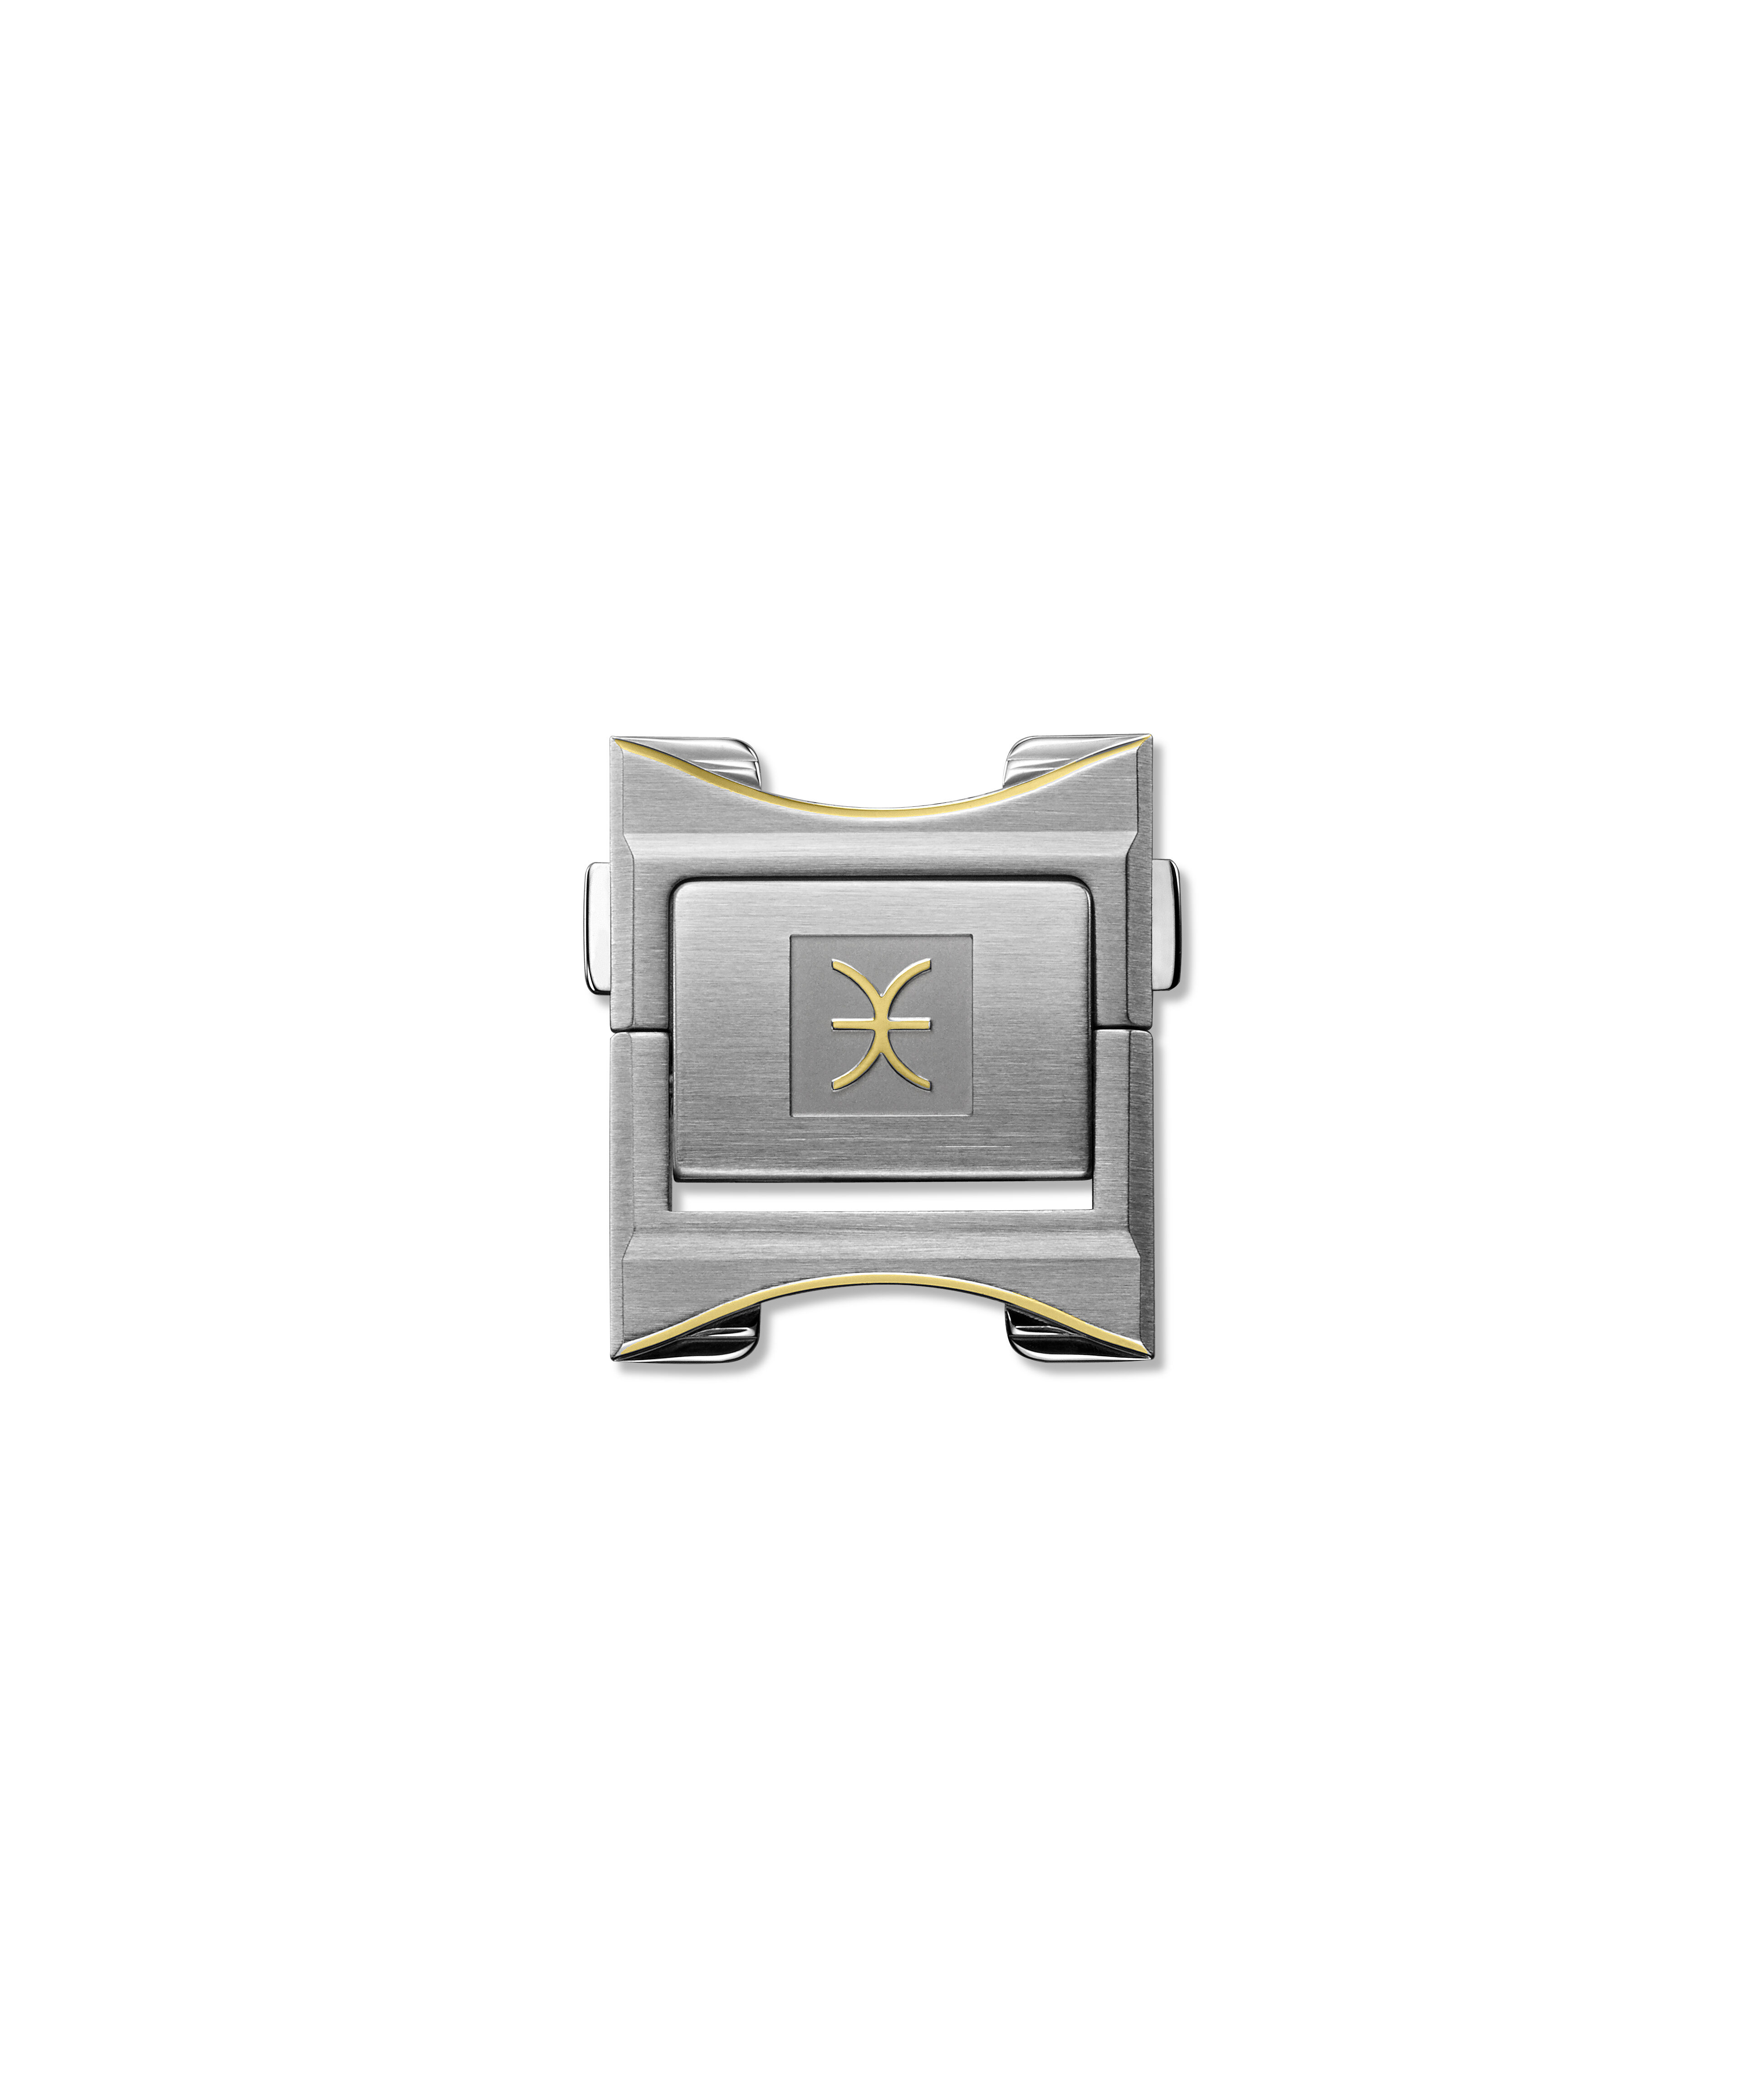 Designer Replica Cartier Watches